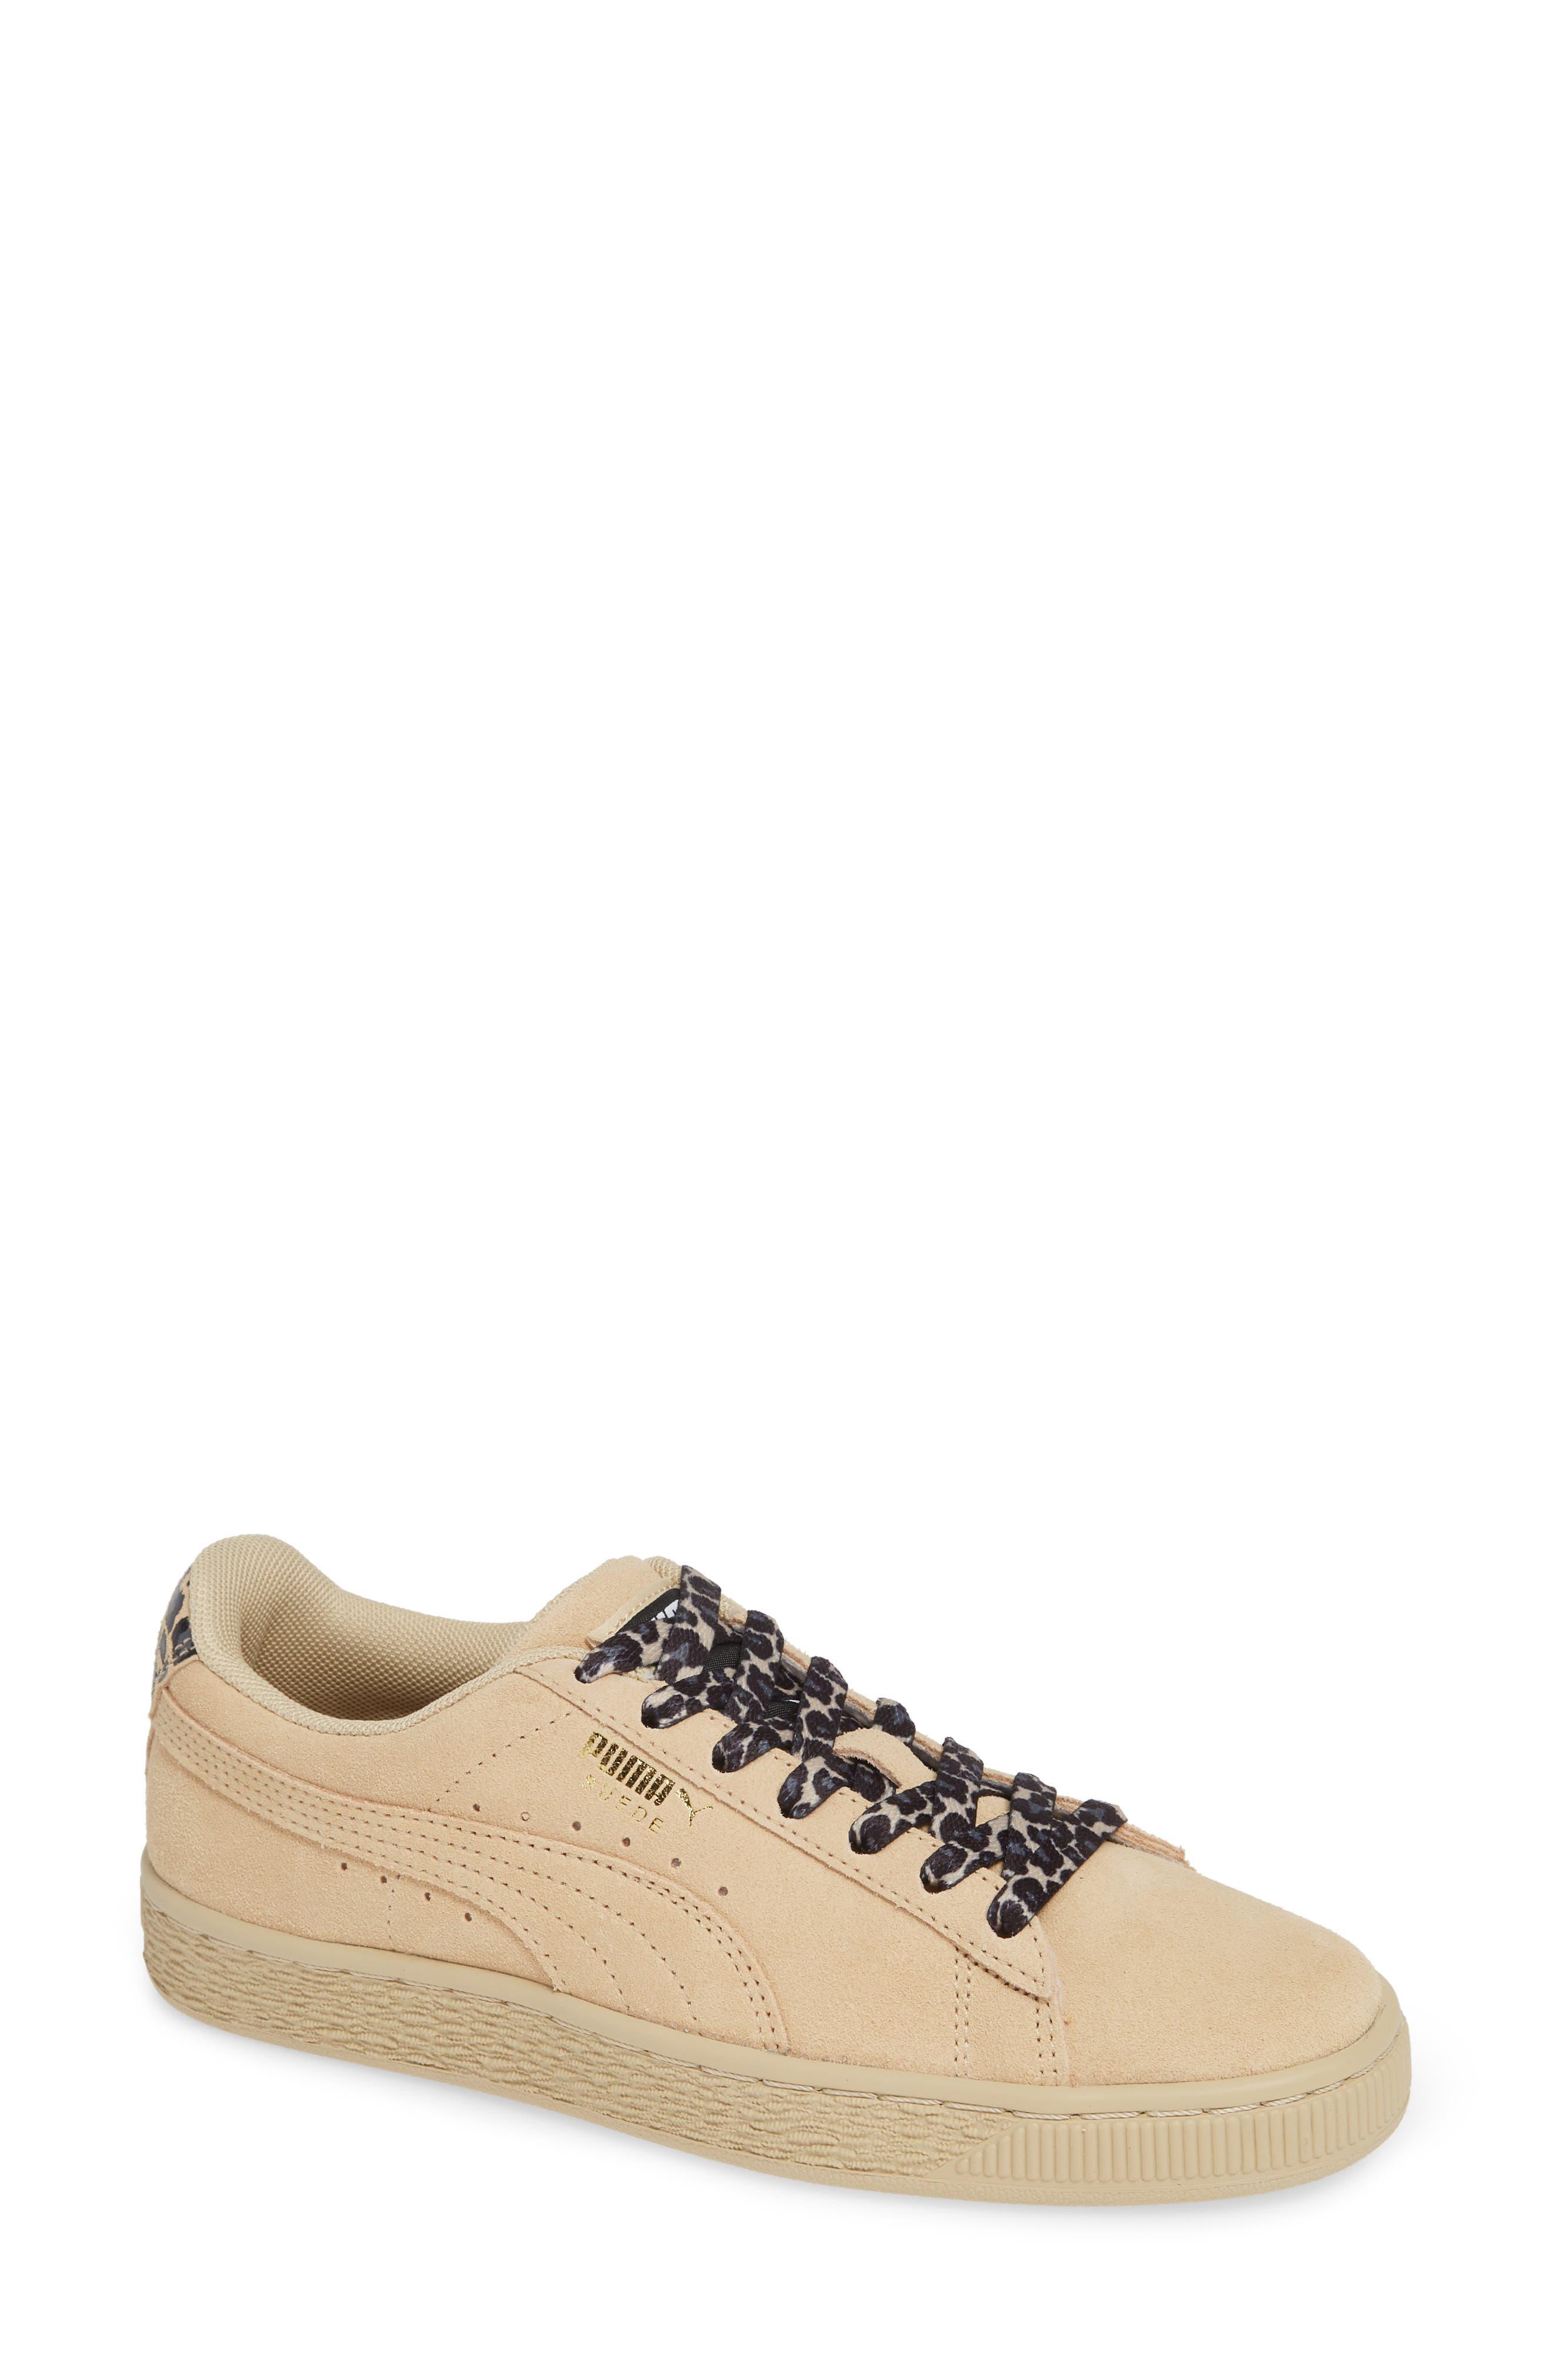 PUMA, Suede Wild Sneaker, Main thumbnail 1, color, 280